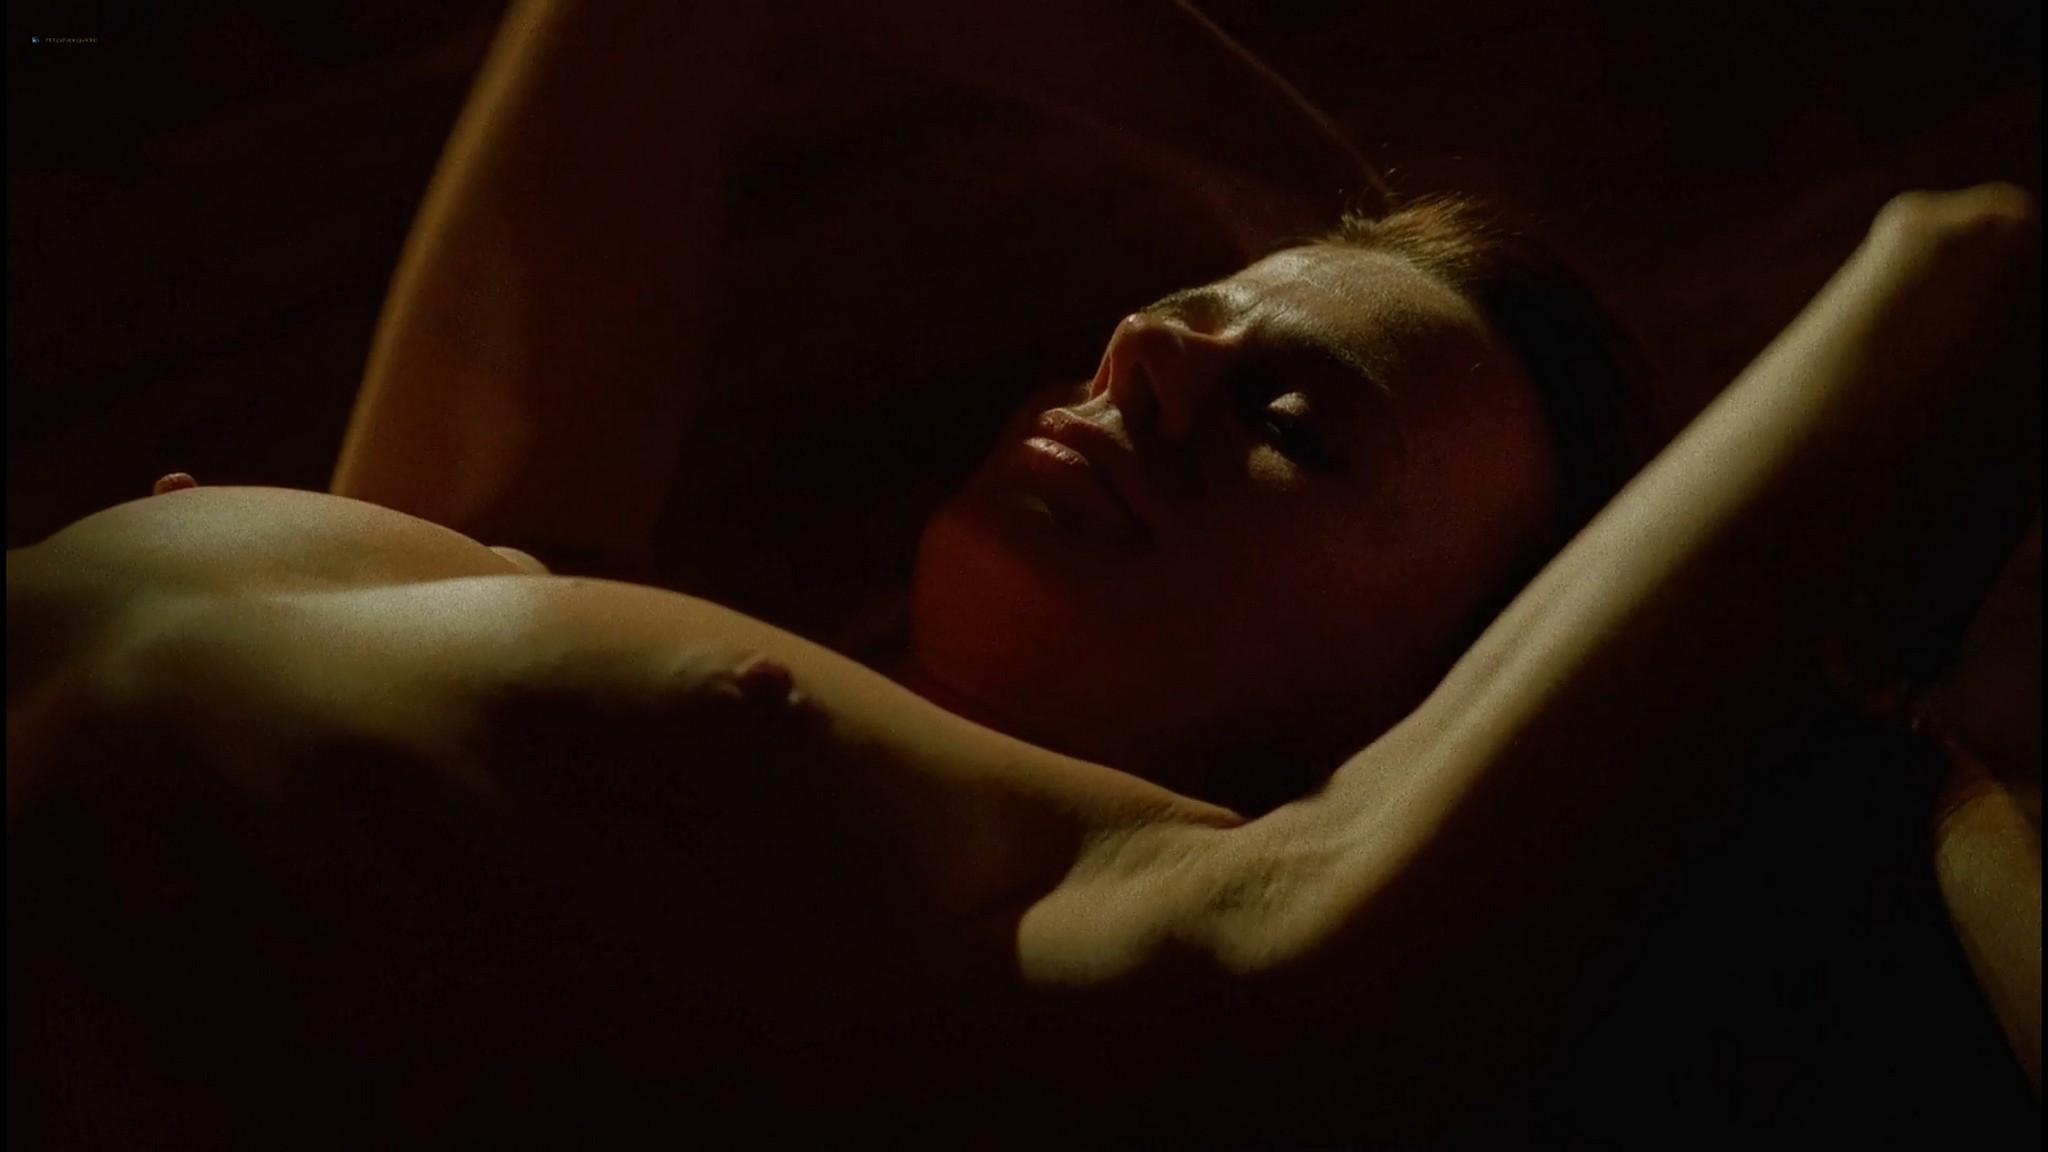 Serena Scott Thomas nude sex Sarah Lassez and others nude too Brothel 2008 1080p Web 3